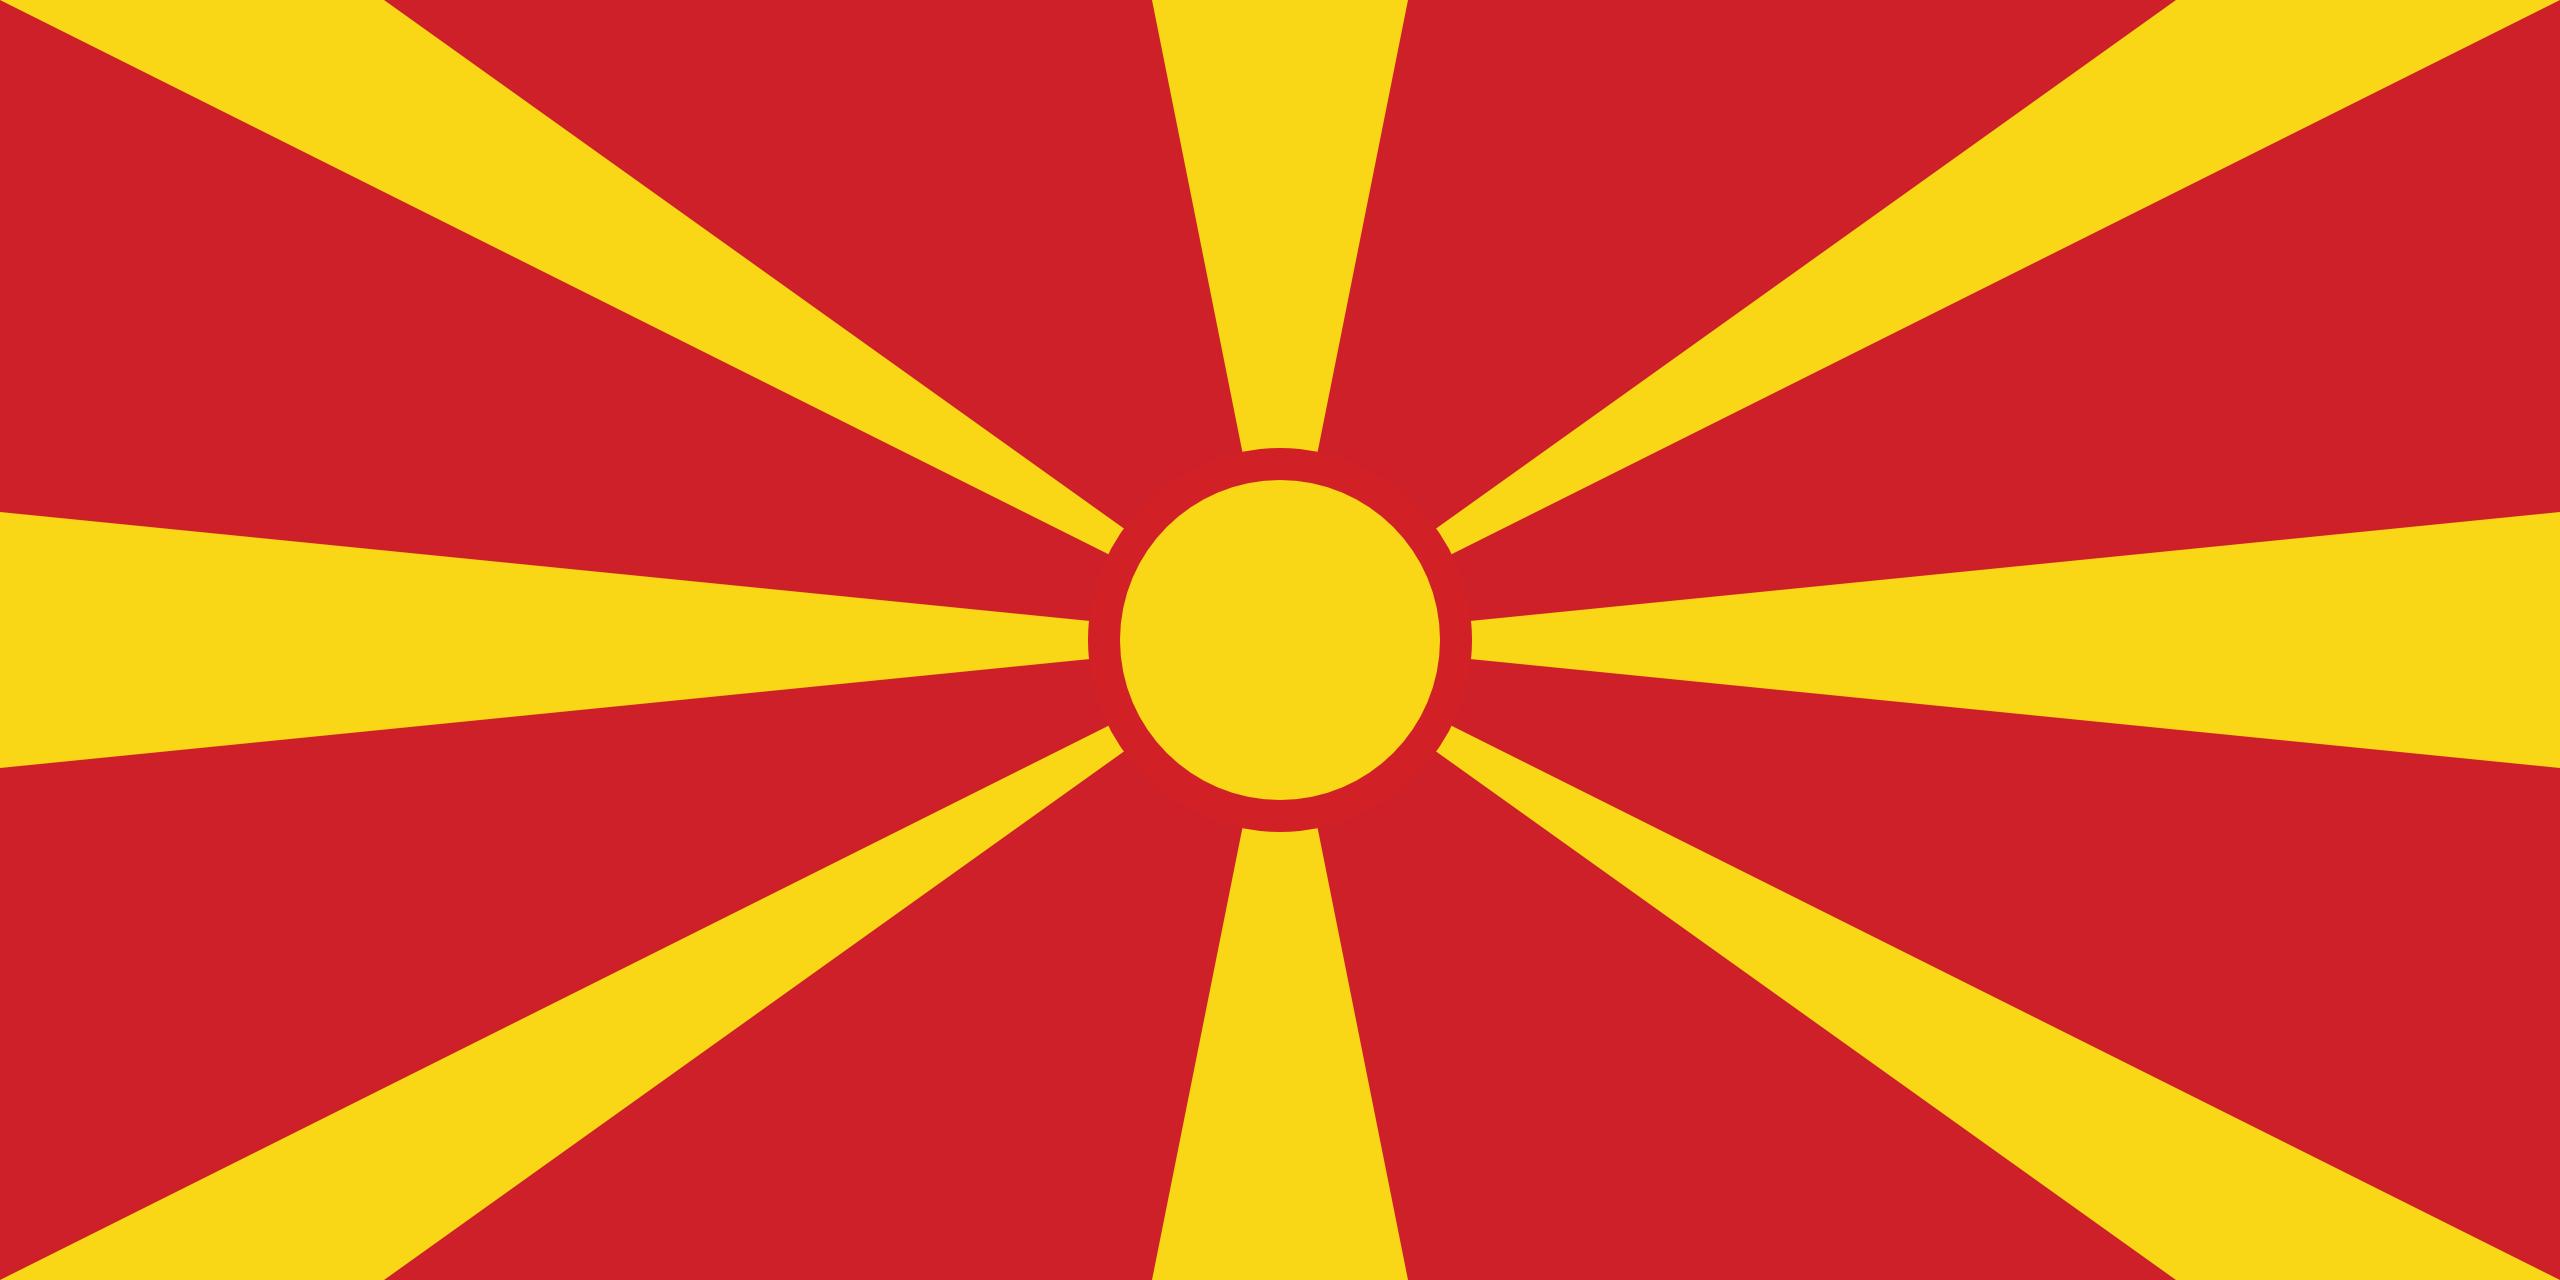 macedonia, страна, Эмблема, логотип, символ - Обои HD - Профессор falken.com